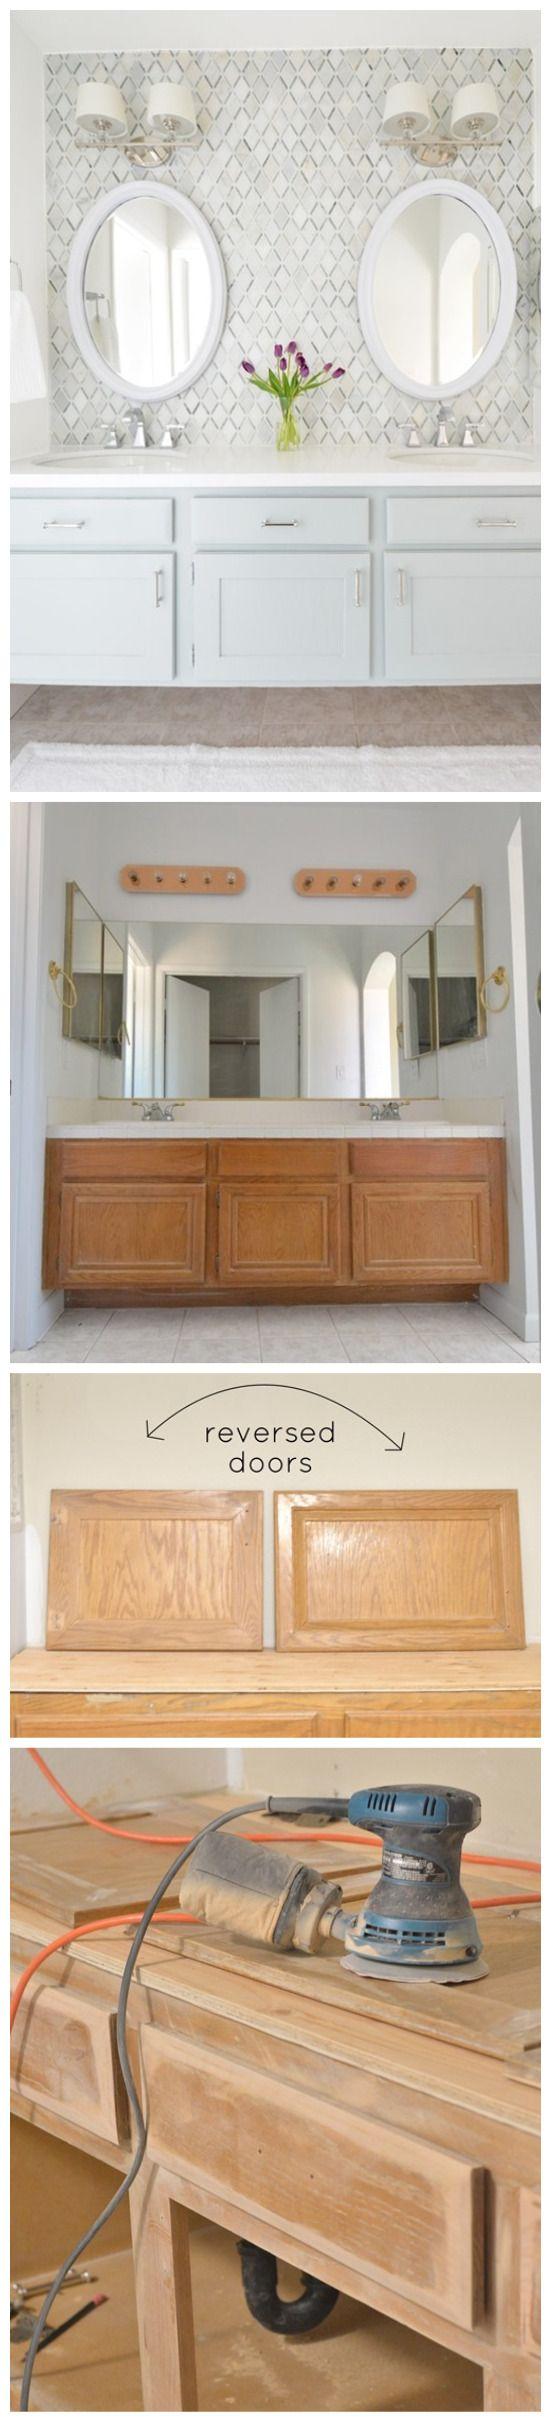 Salle De Bain Dans Les Combles ~ Tip 1st We Updated The Builder Grade Cabinet Into A Floating